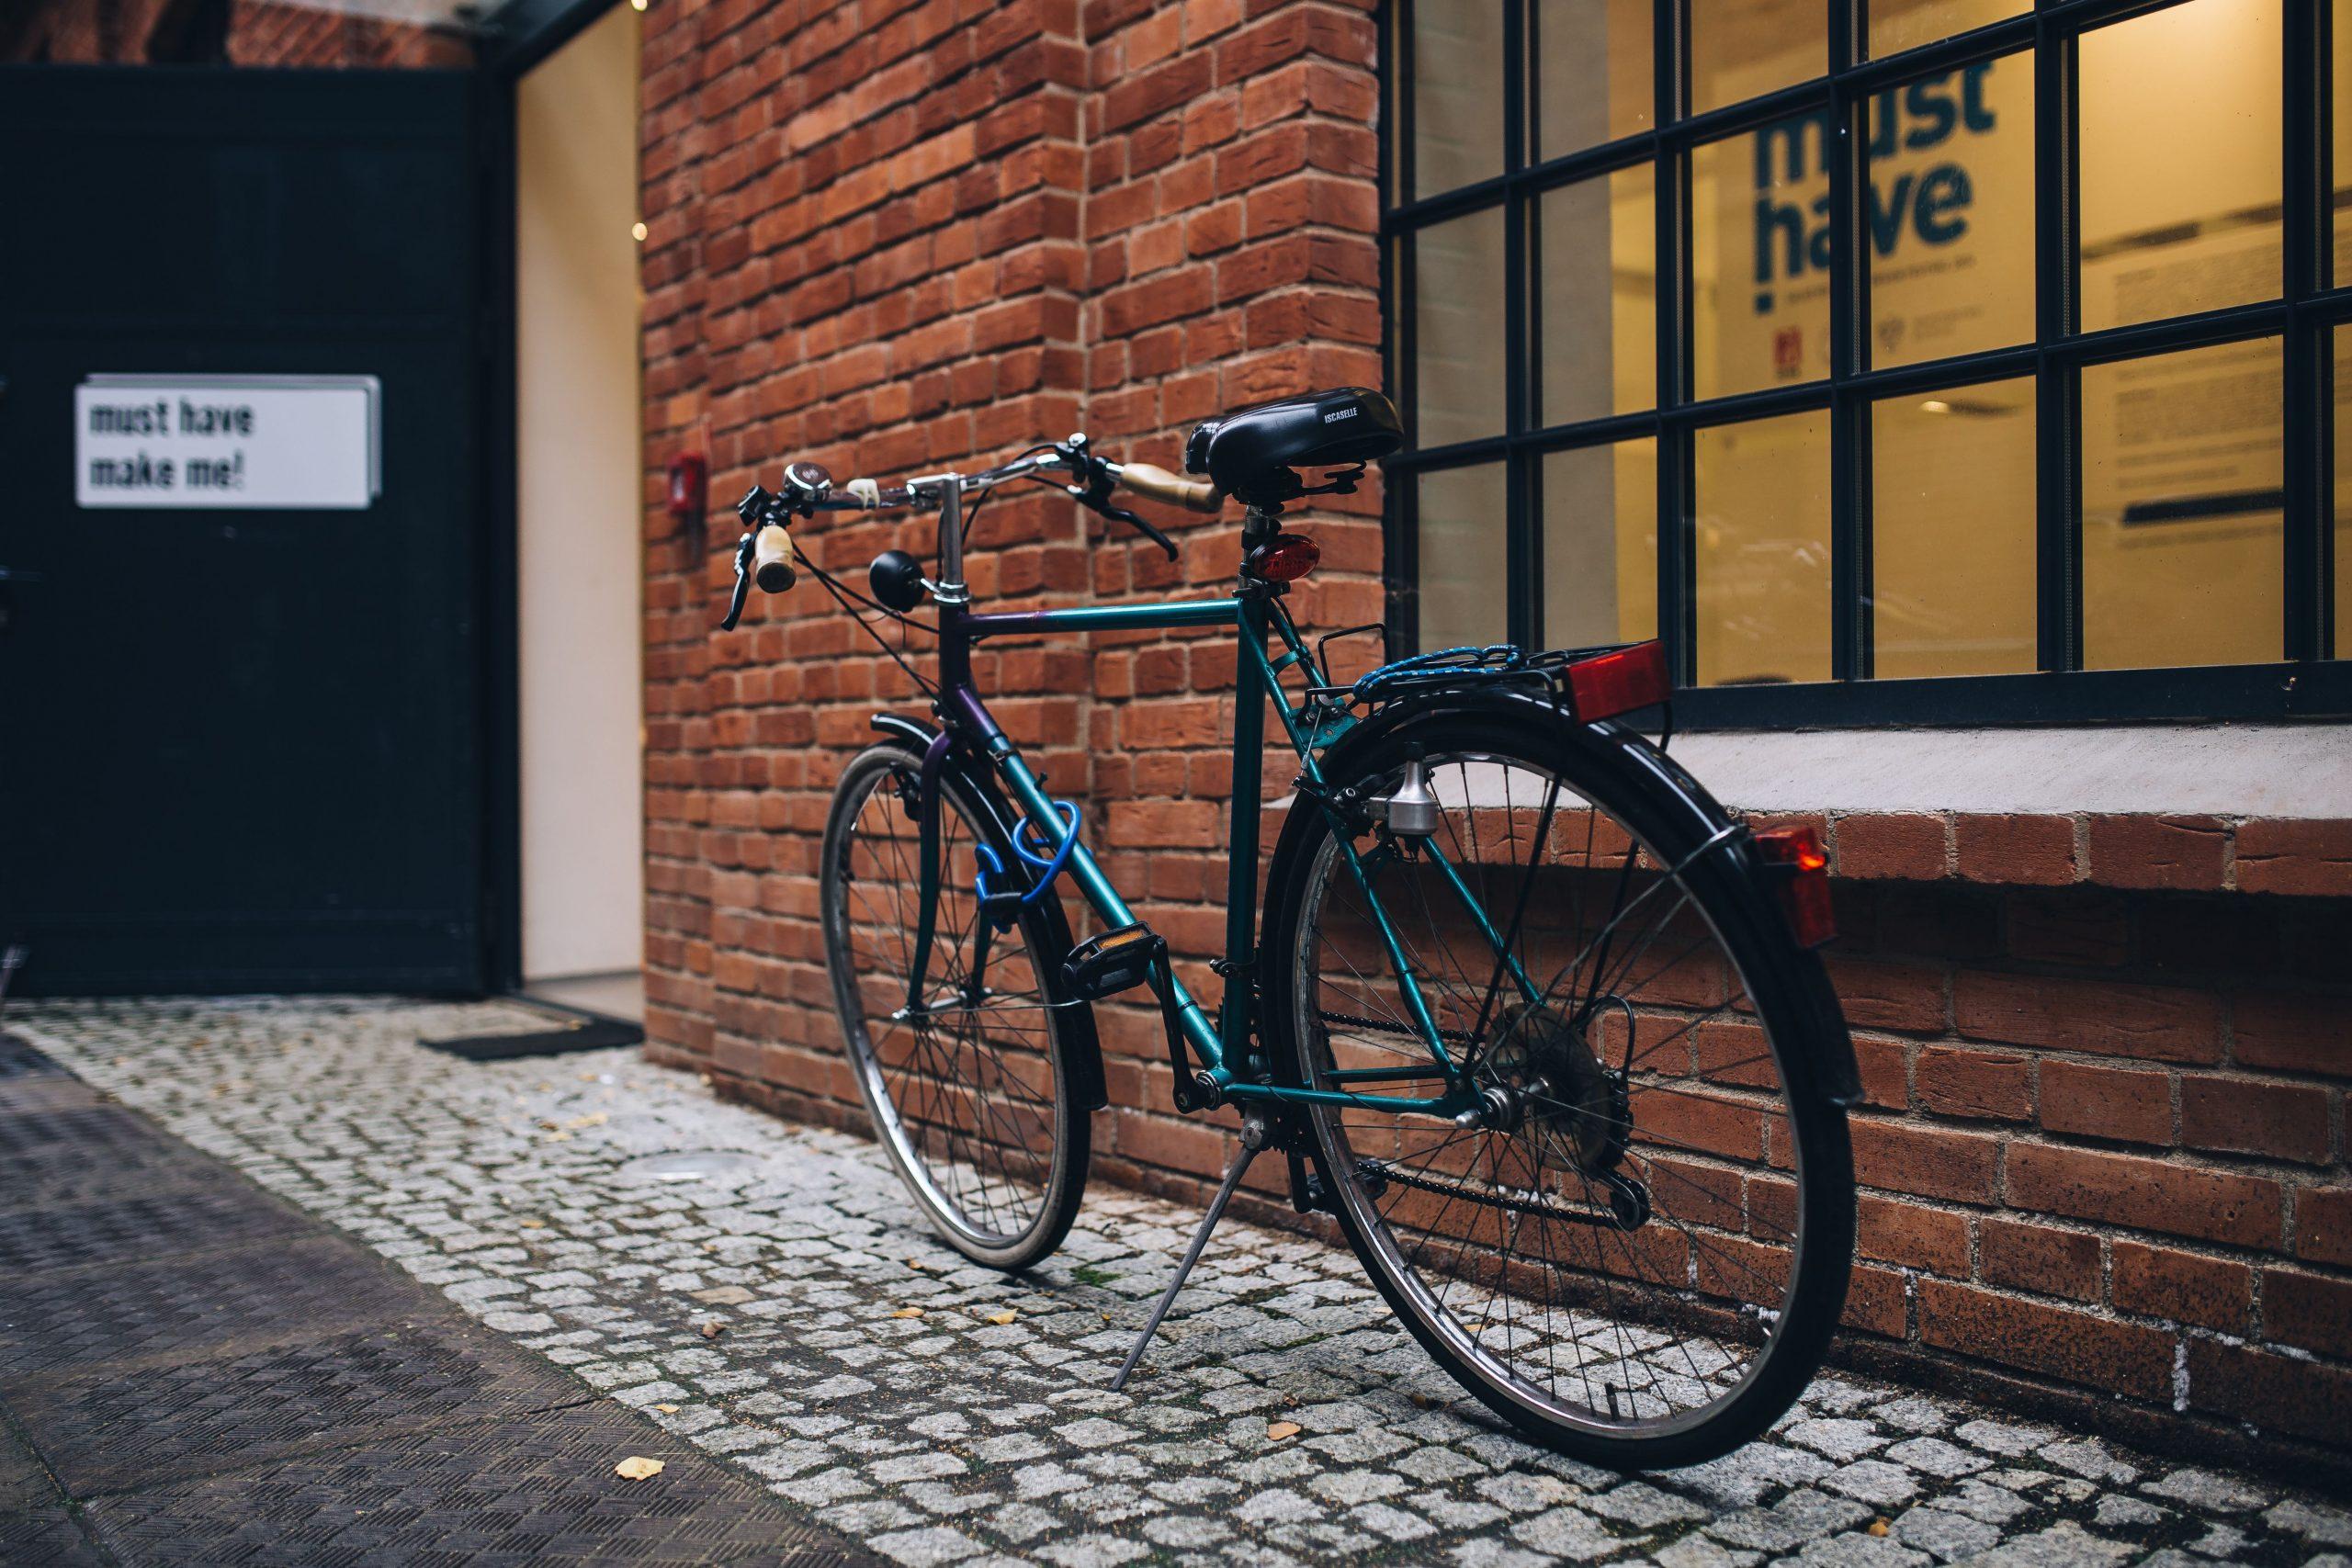 Bicicleta plegable: ¿Cuál es la mejor del 2021?